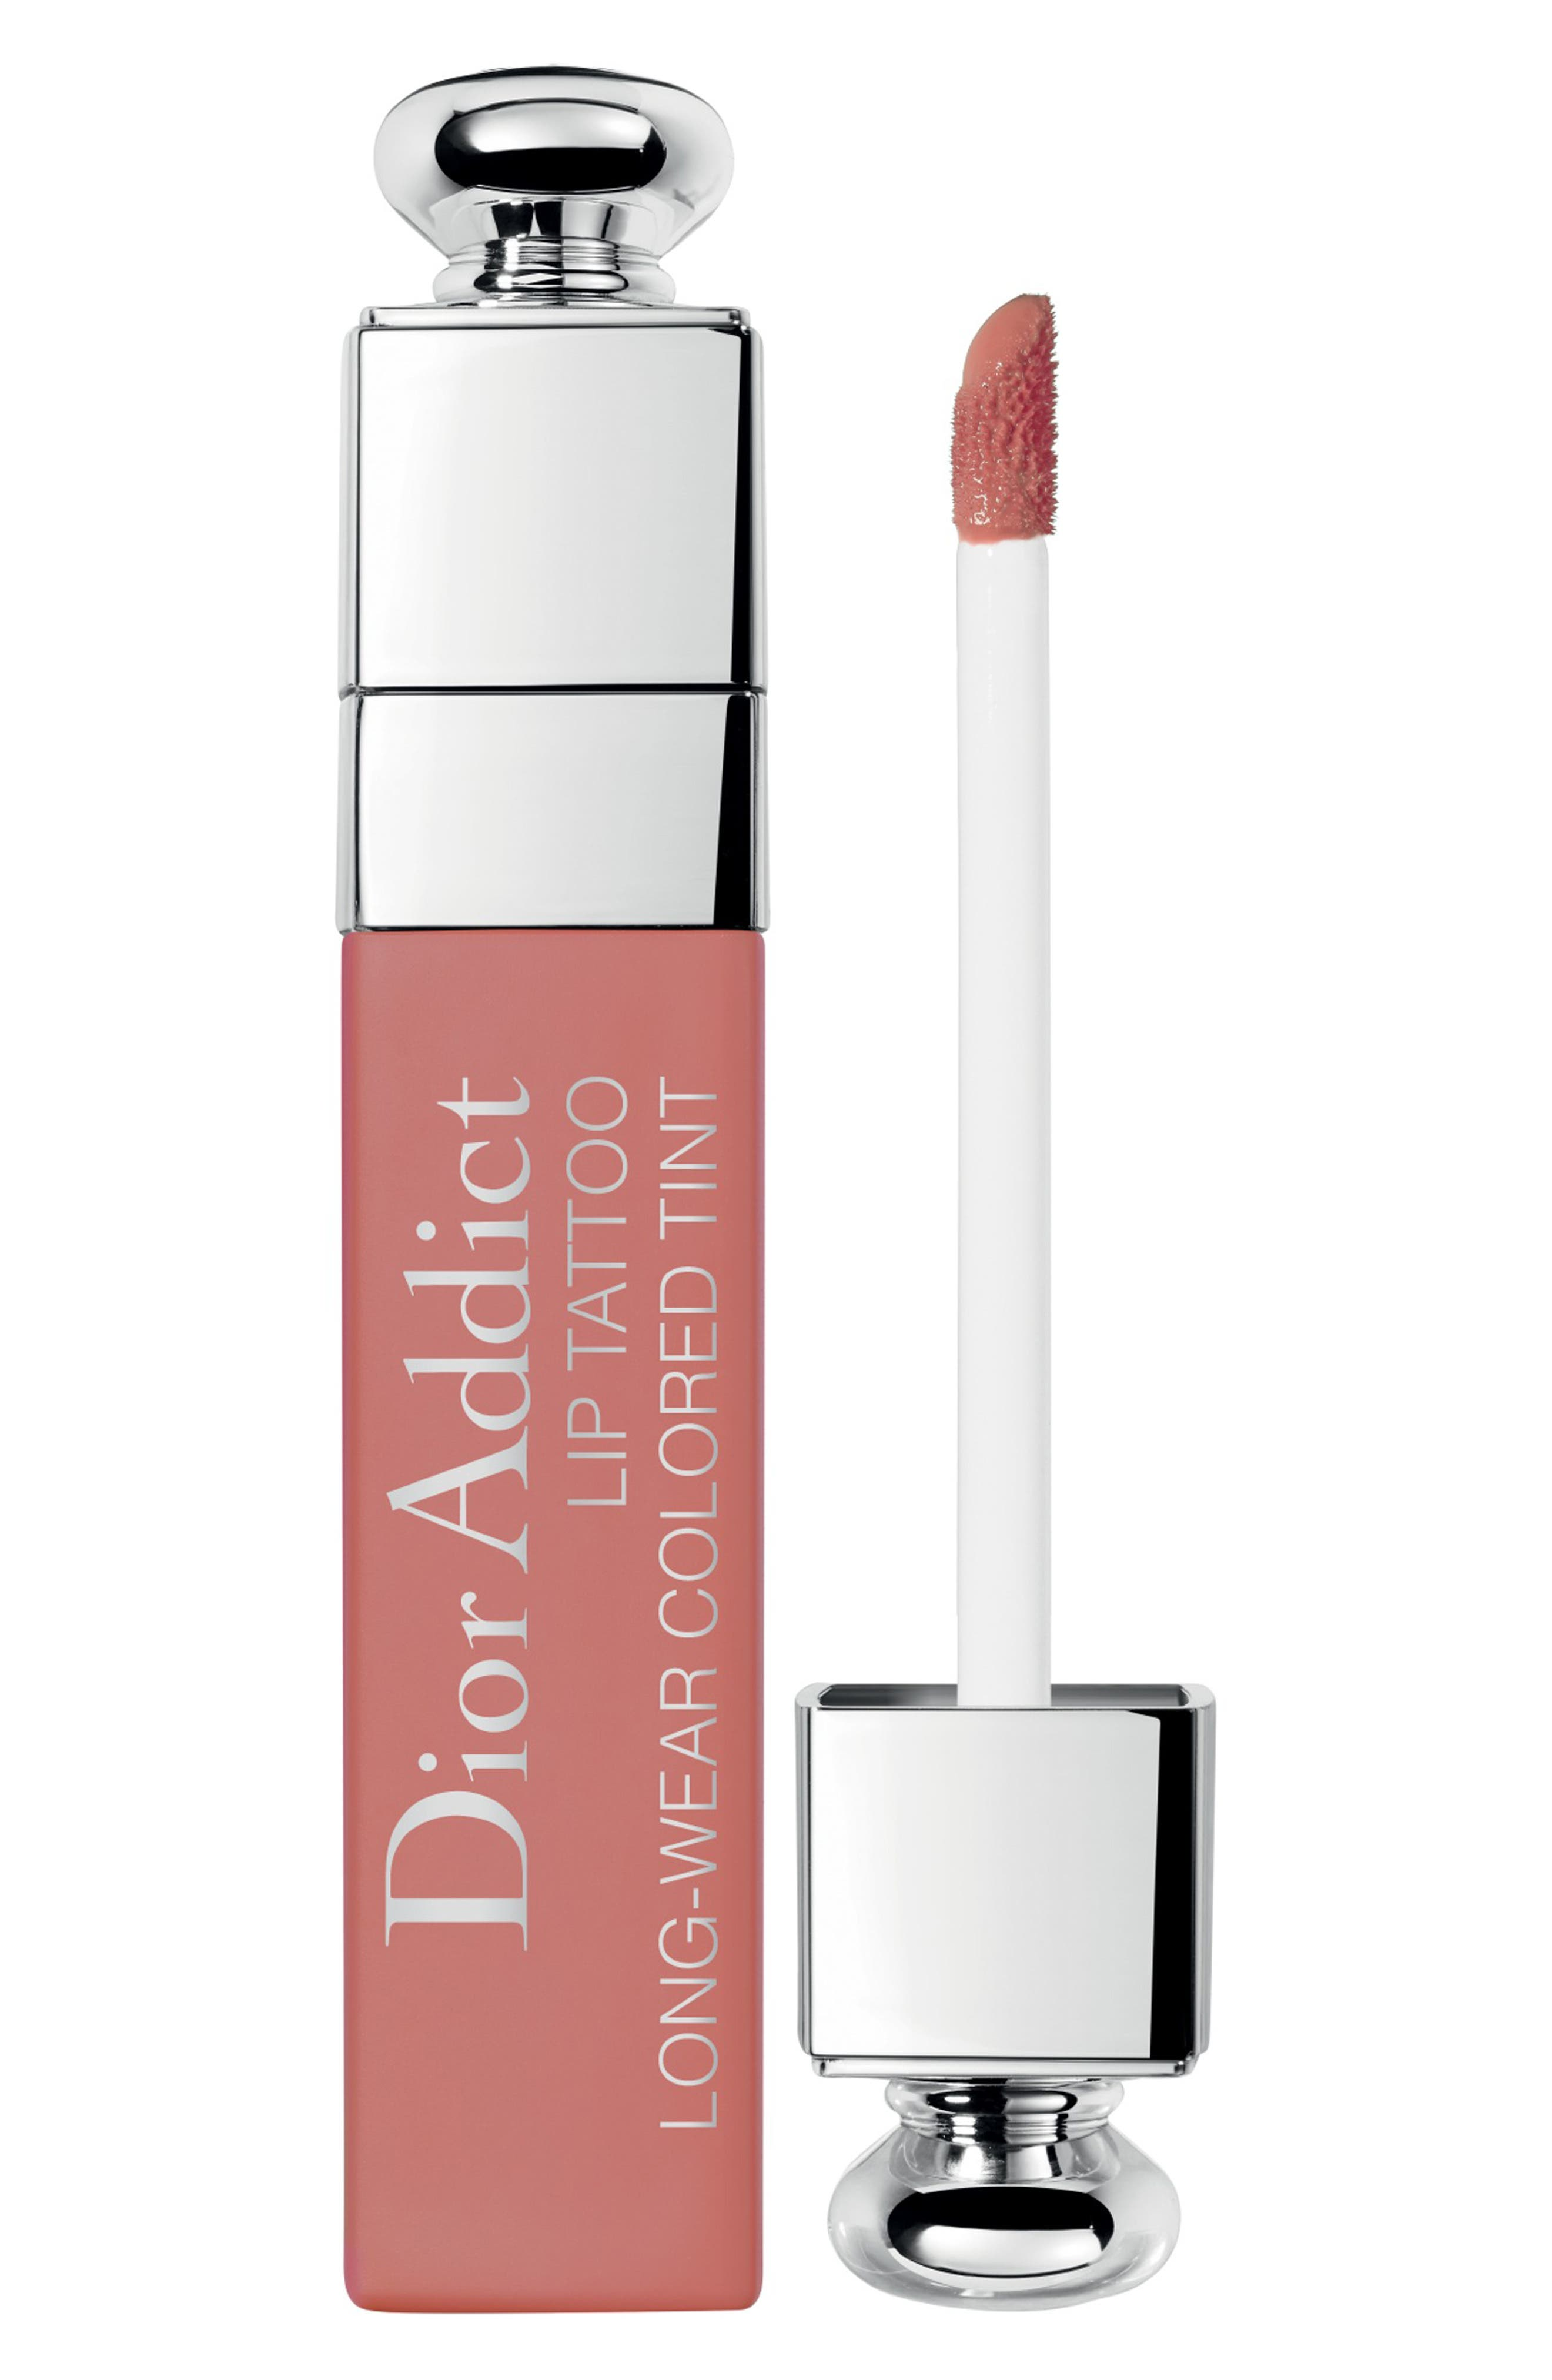 Dior Addict Lip Tattoo Long-Wearing Color Tint - 321 Natural Rose